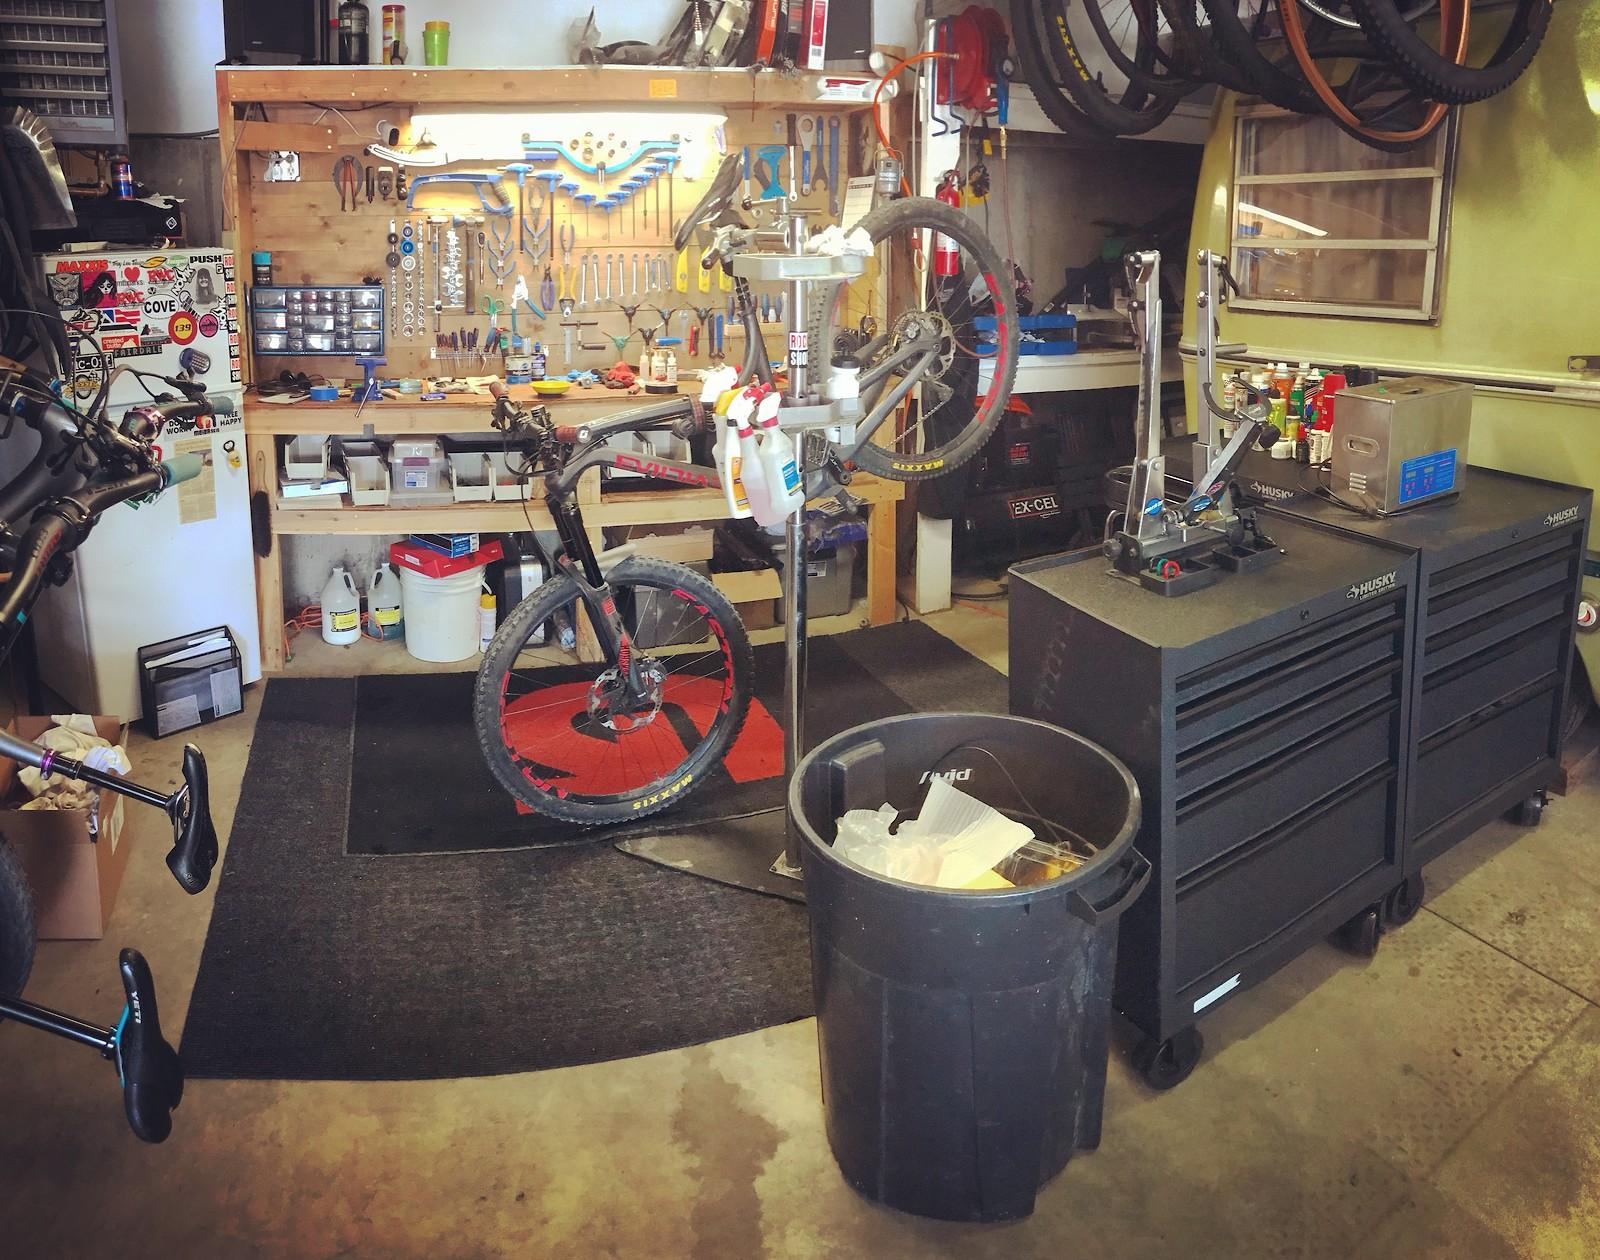 Show Us Your Workshop - The Hub - Mountain Biking Forums